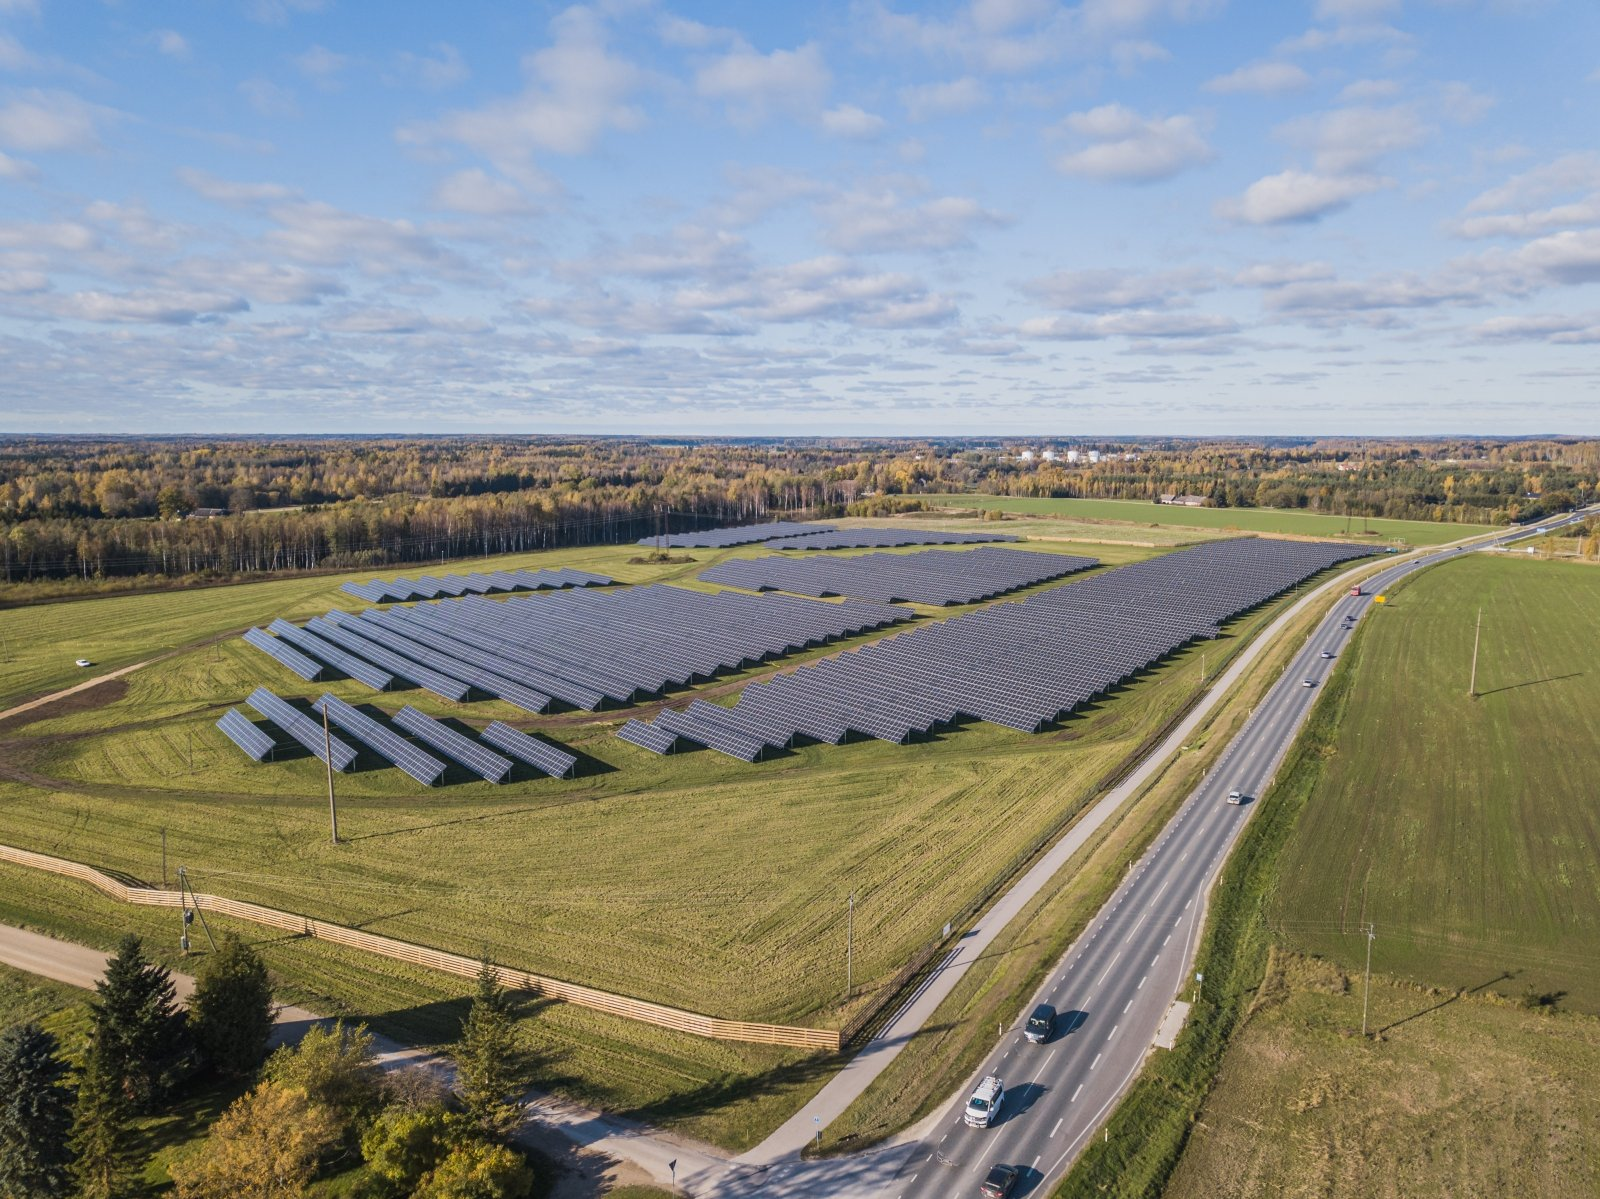 Island, Liechtenstein ja Norra annavad Eestile kuus miljonit eurot keskkonna- ja kliimaprojektide elluviimiseks: